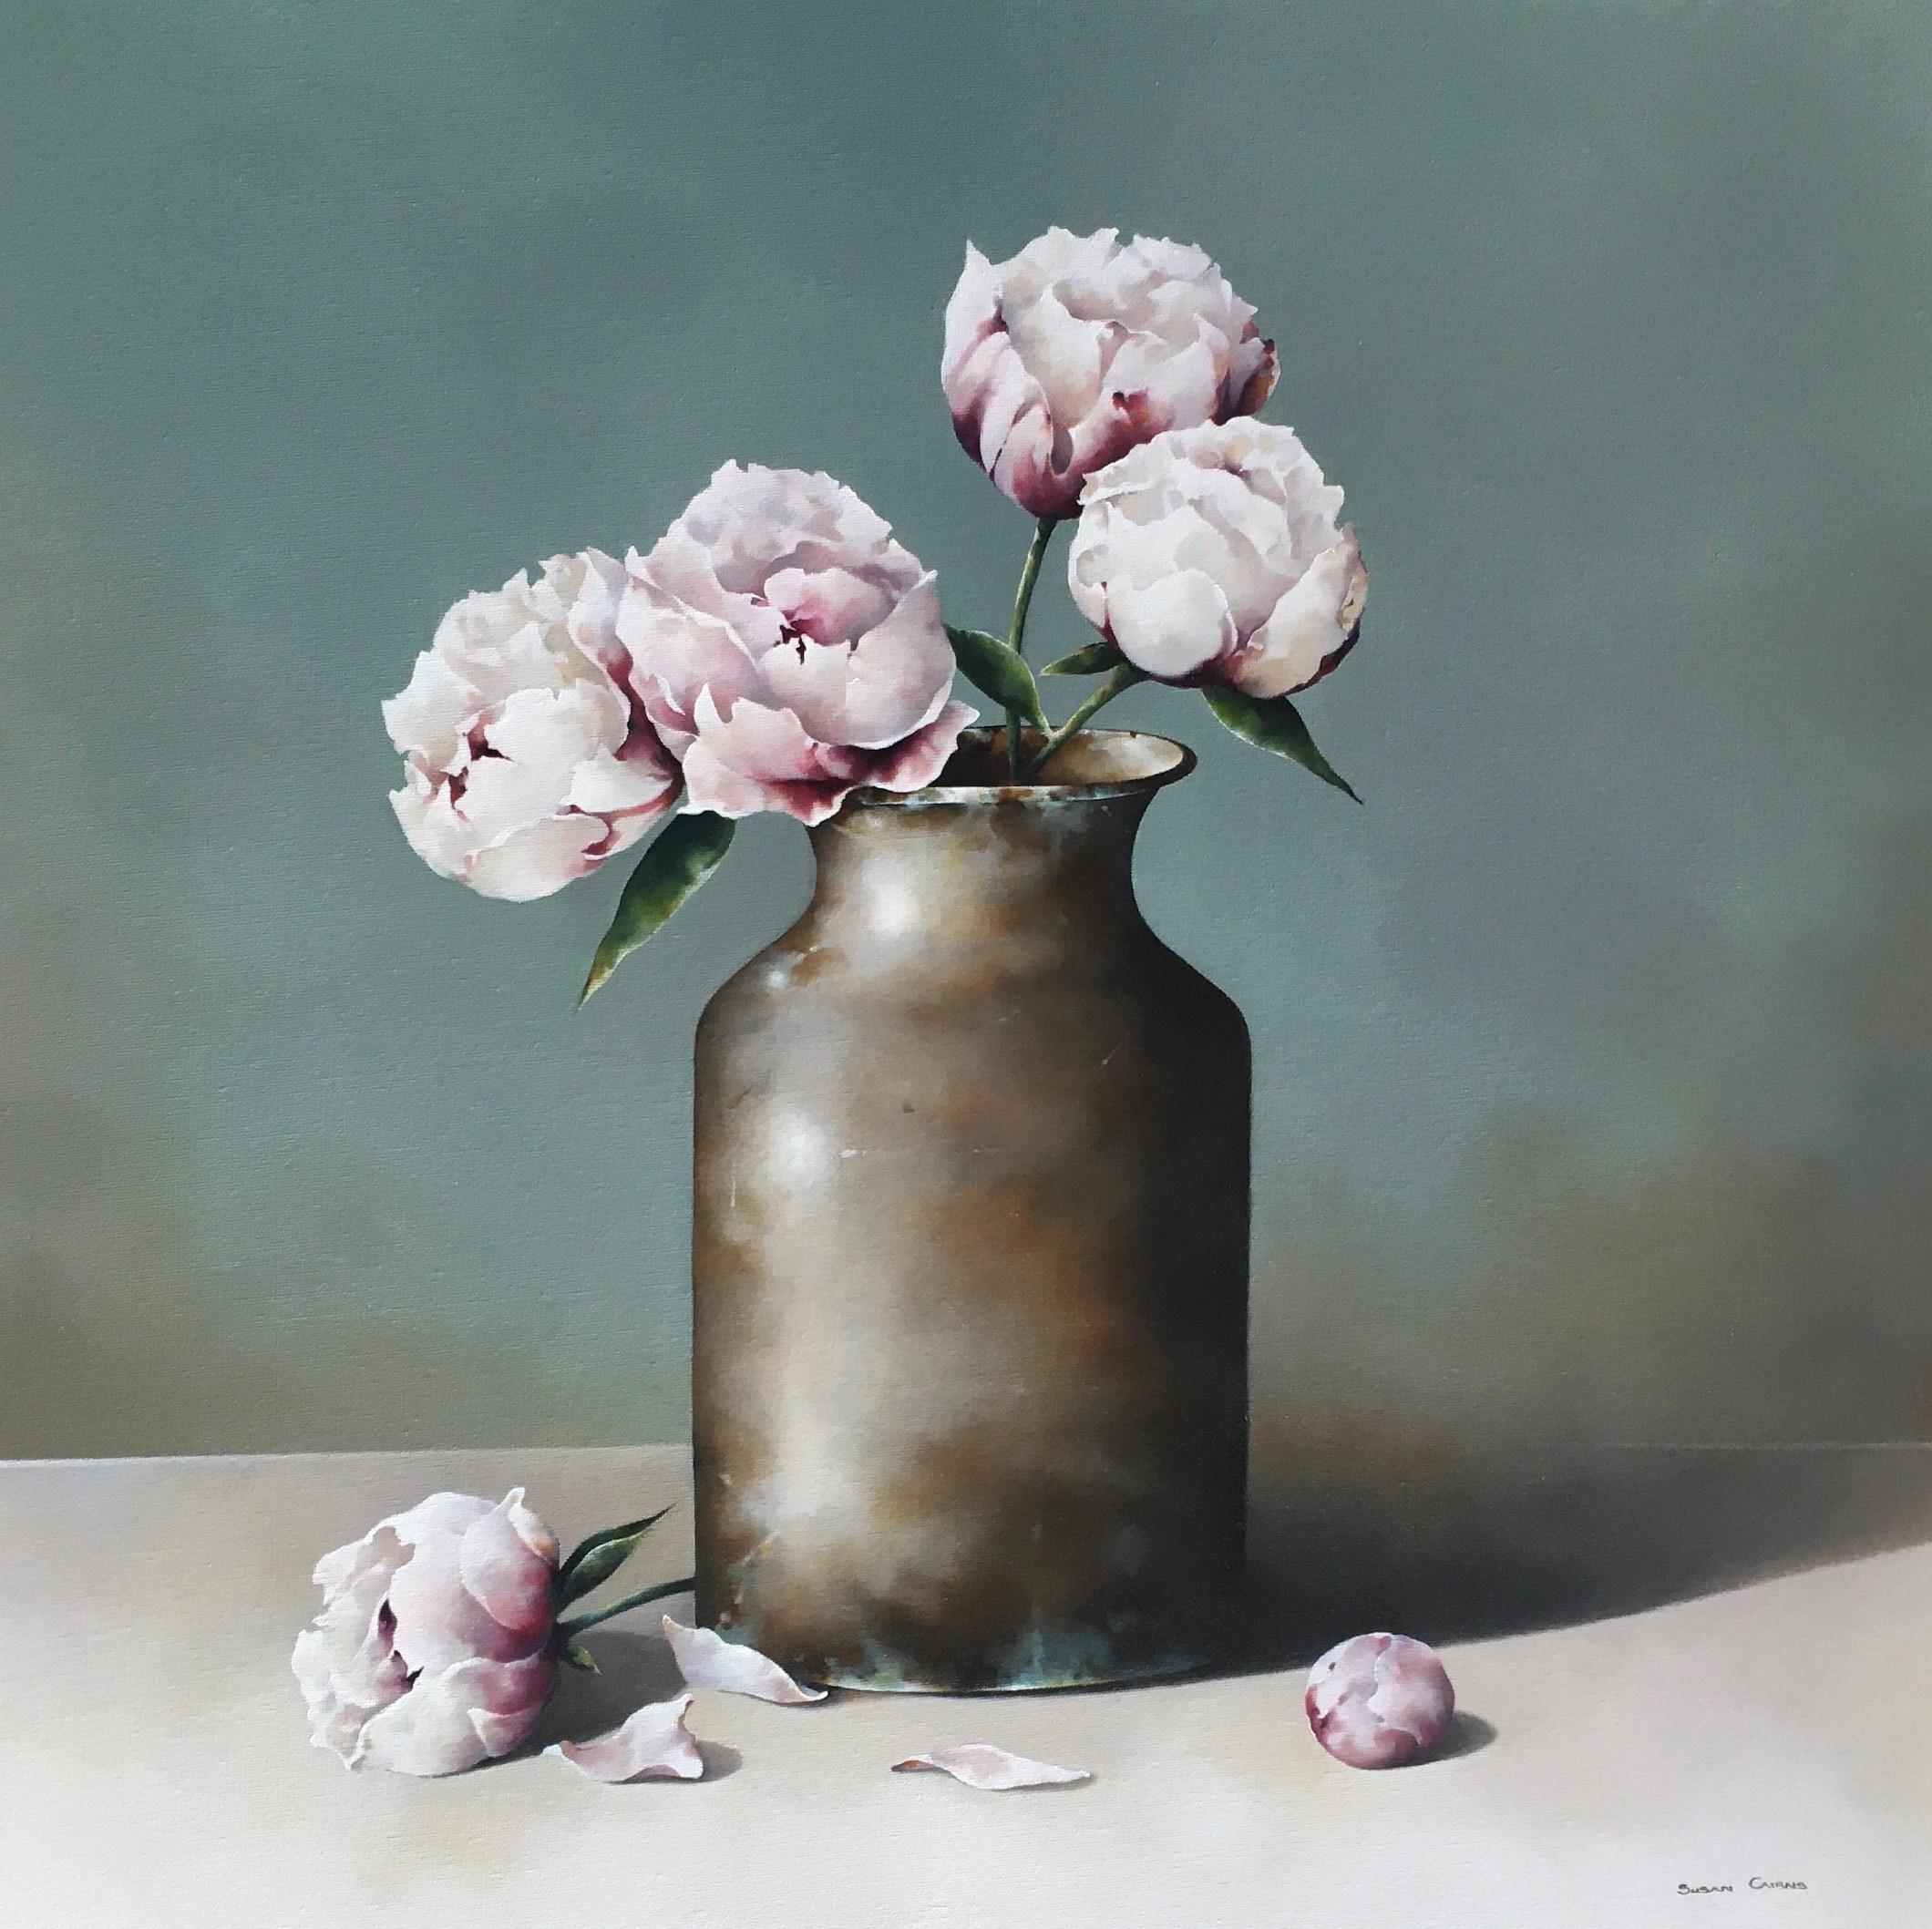 Susan Cairns, Peonies, 2020, £2450, oil, original, The Art Agency